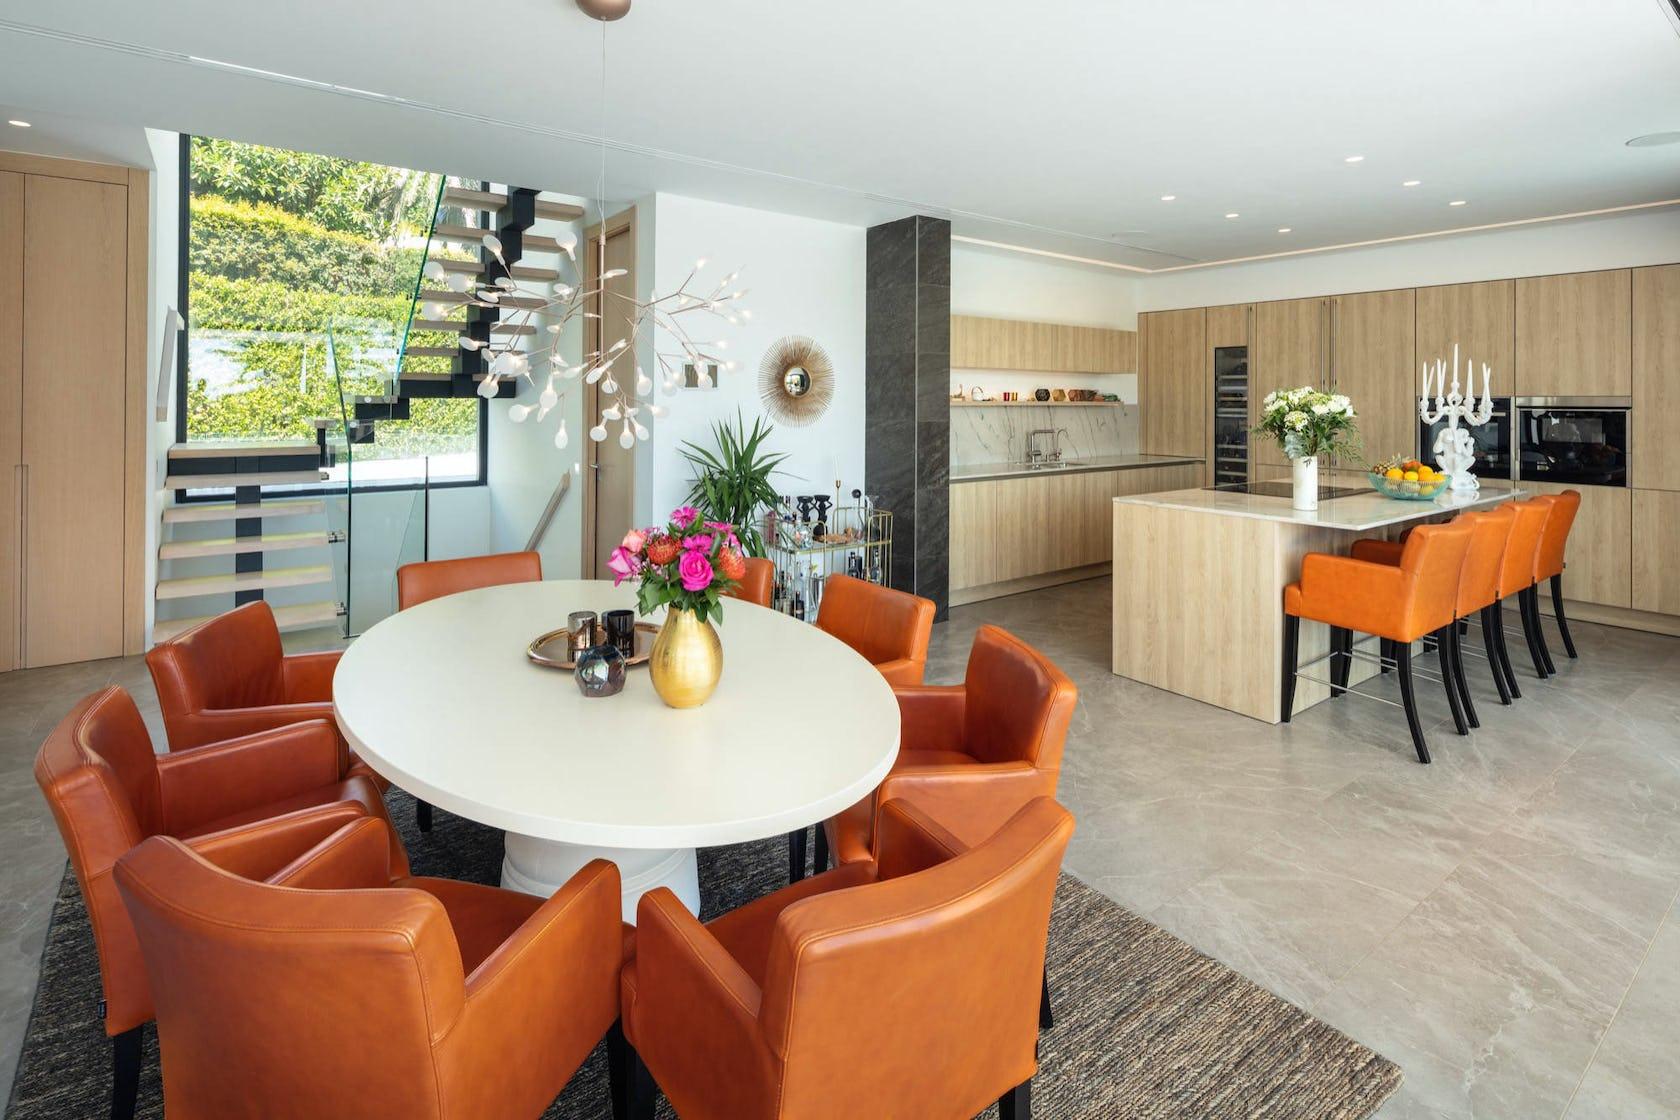 chair furniture interior design indoors room lobby living room table flooring